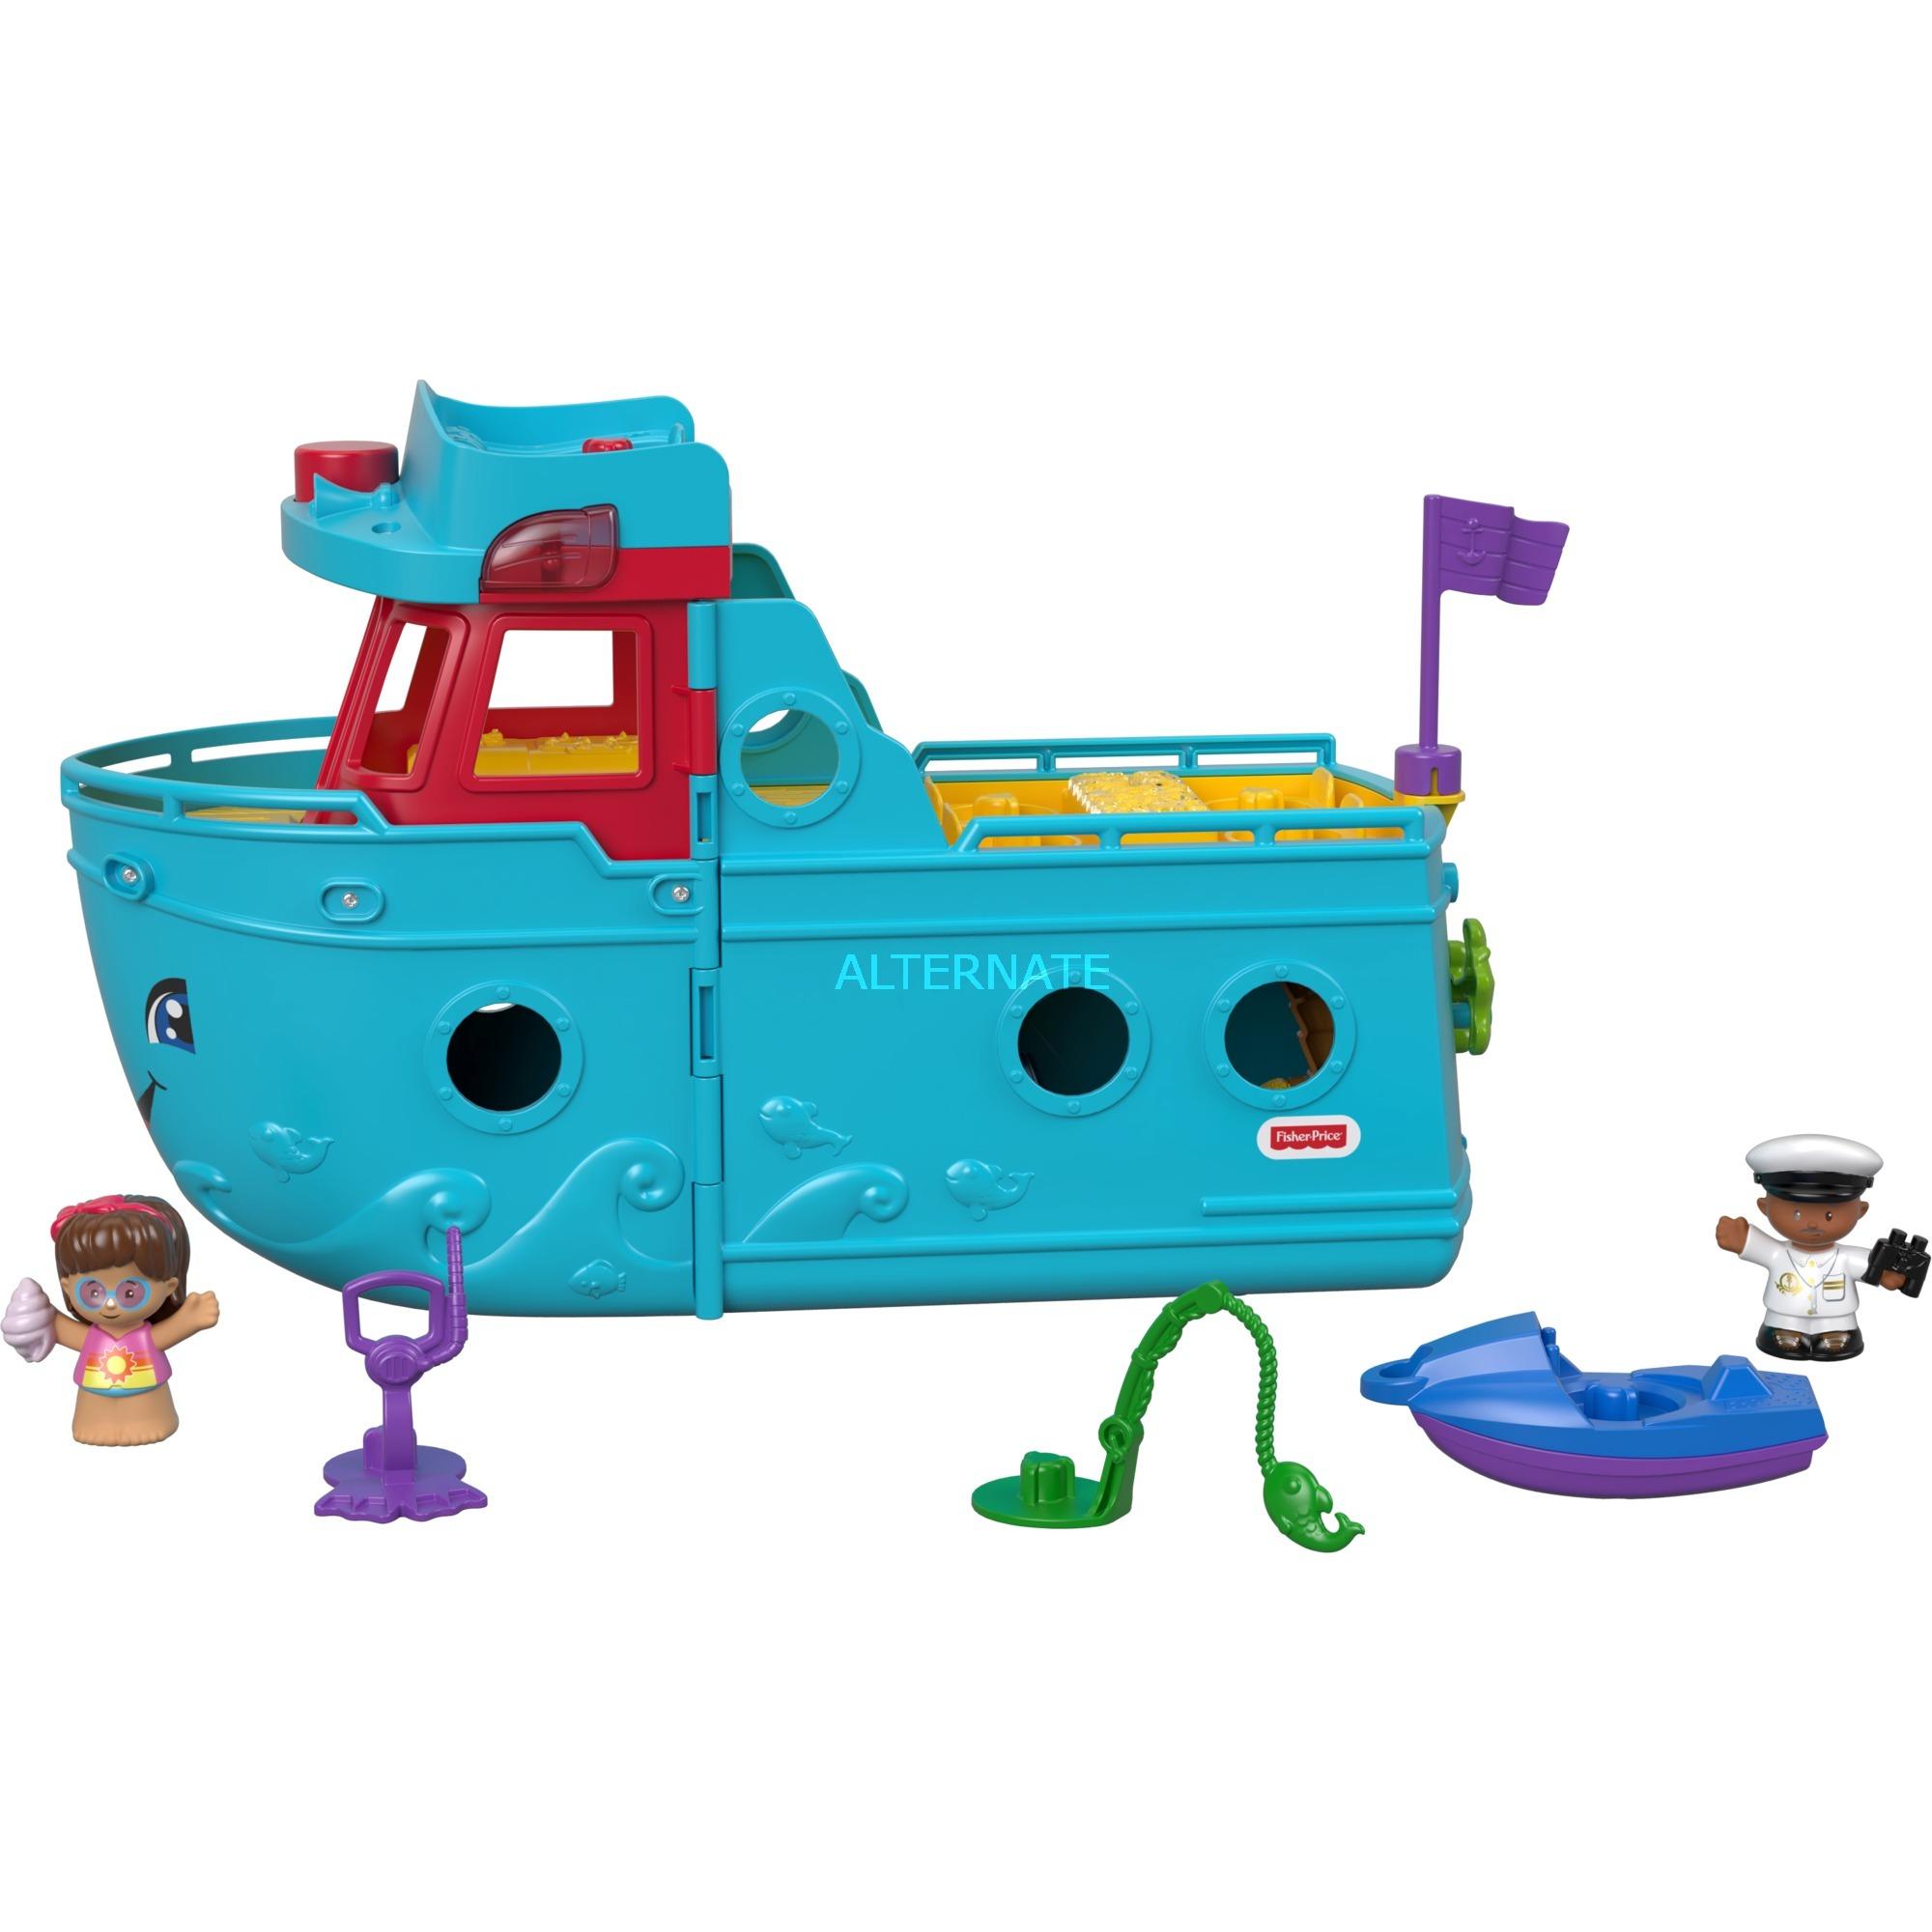 Little People FXJ47 vehículo de juguete De plástico